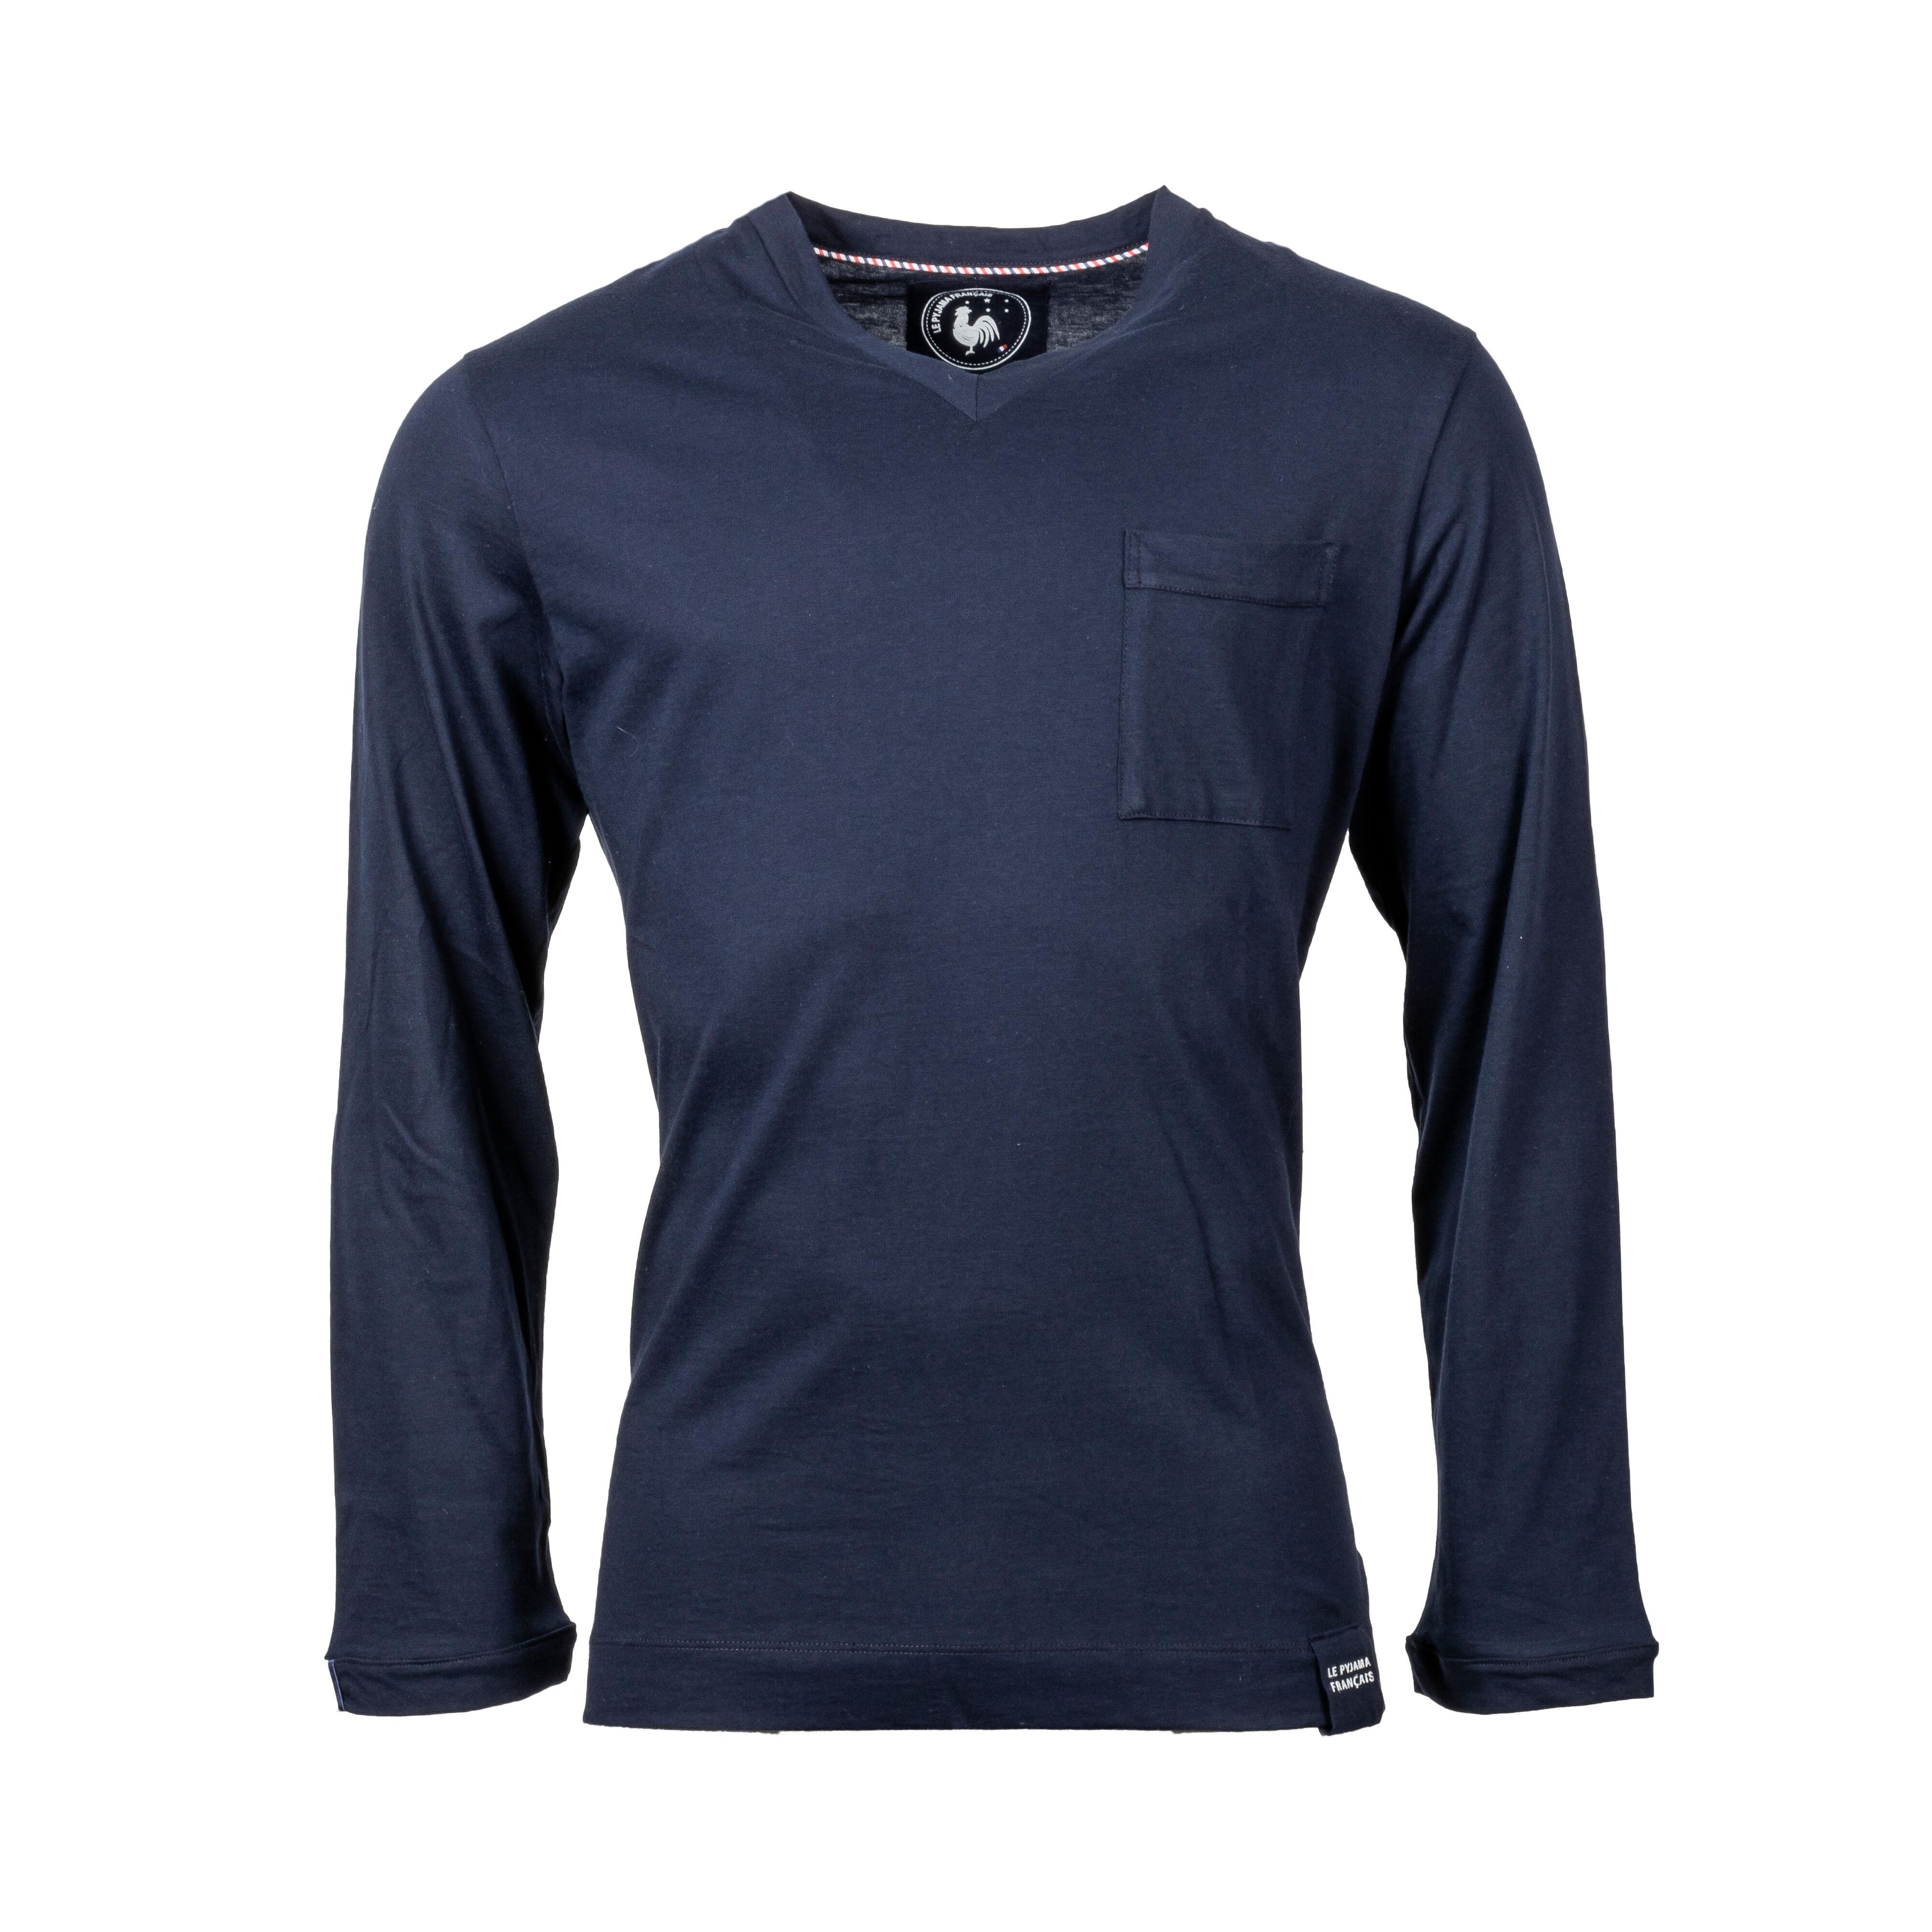 Le Pyjama Français Tee-shirt de pyjama manches longues Made in France Le Pyjama Français en coton bleu marine - BLEU - XXL